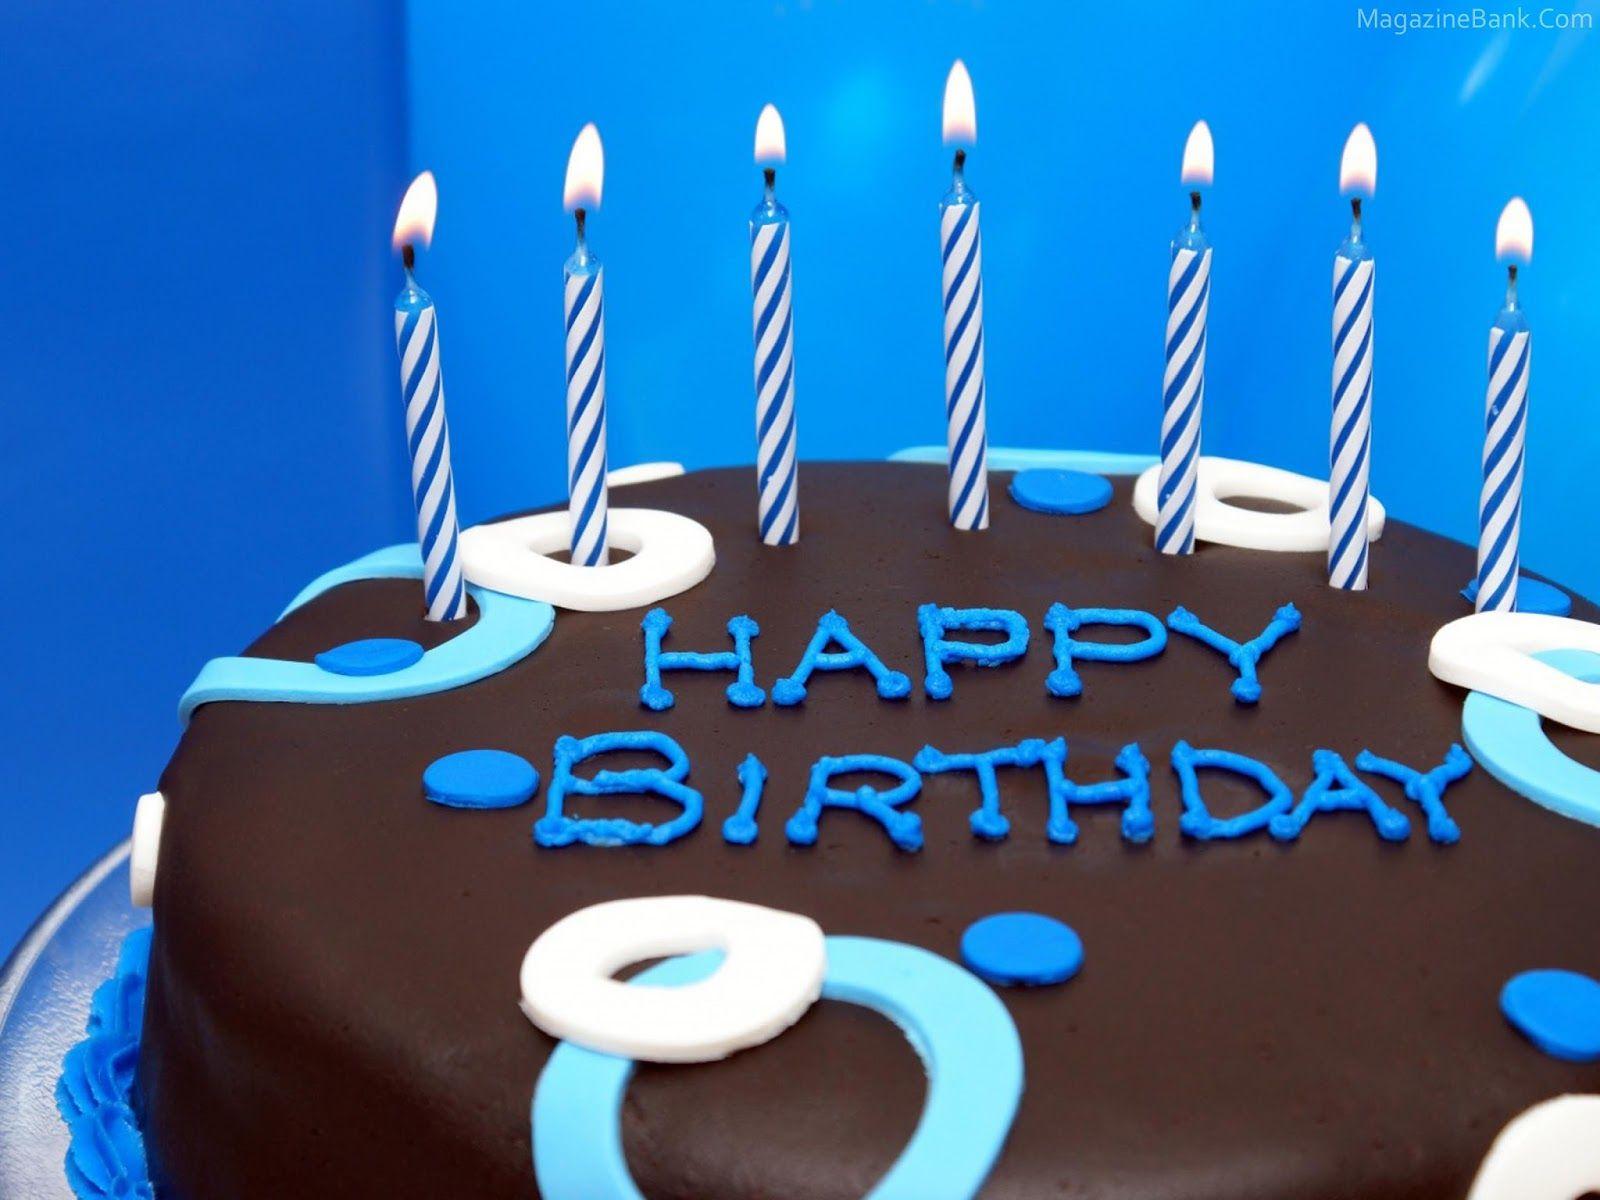 Top Happy Birthday Ecards Download Free